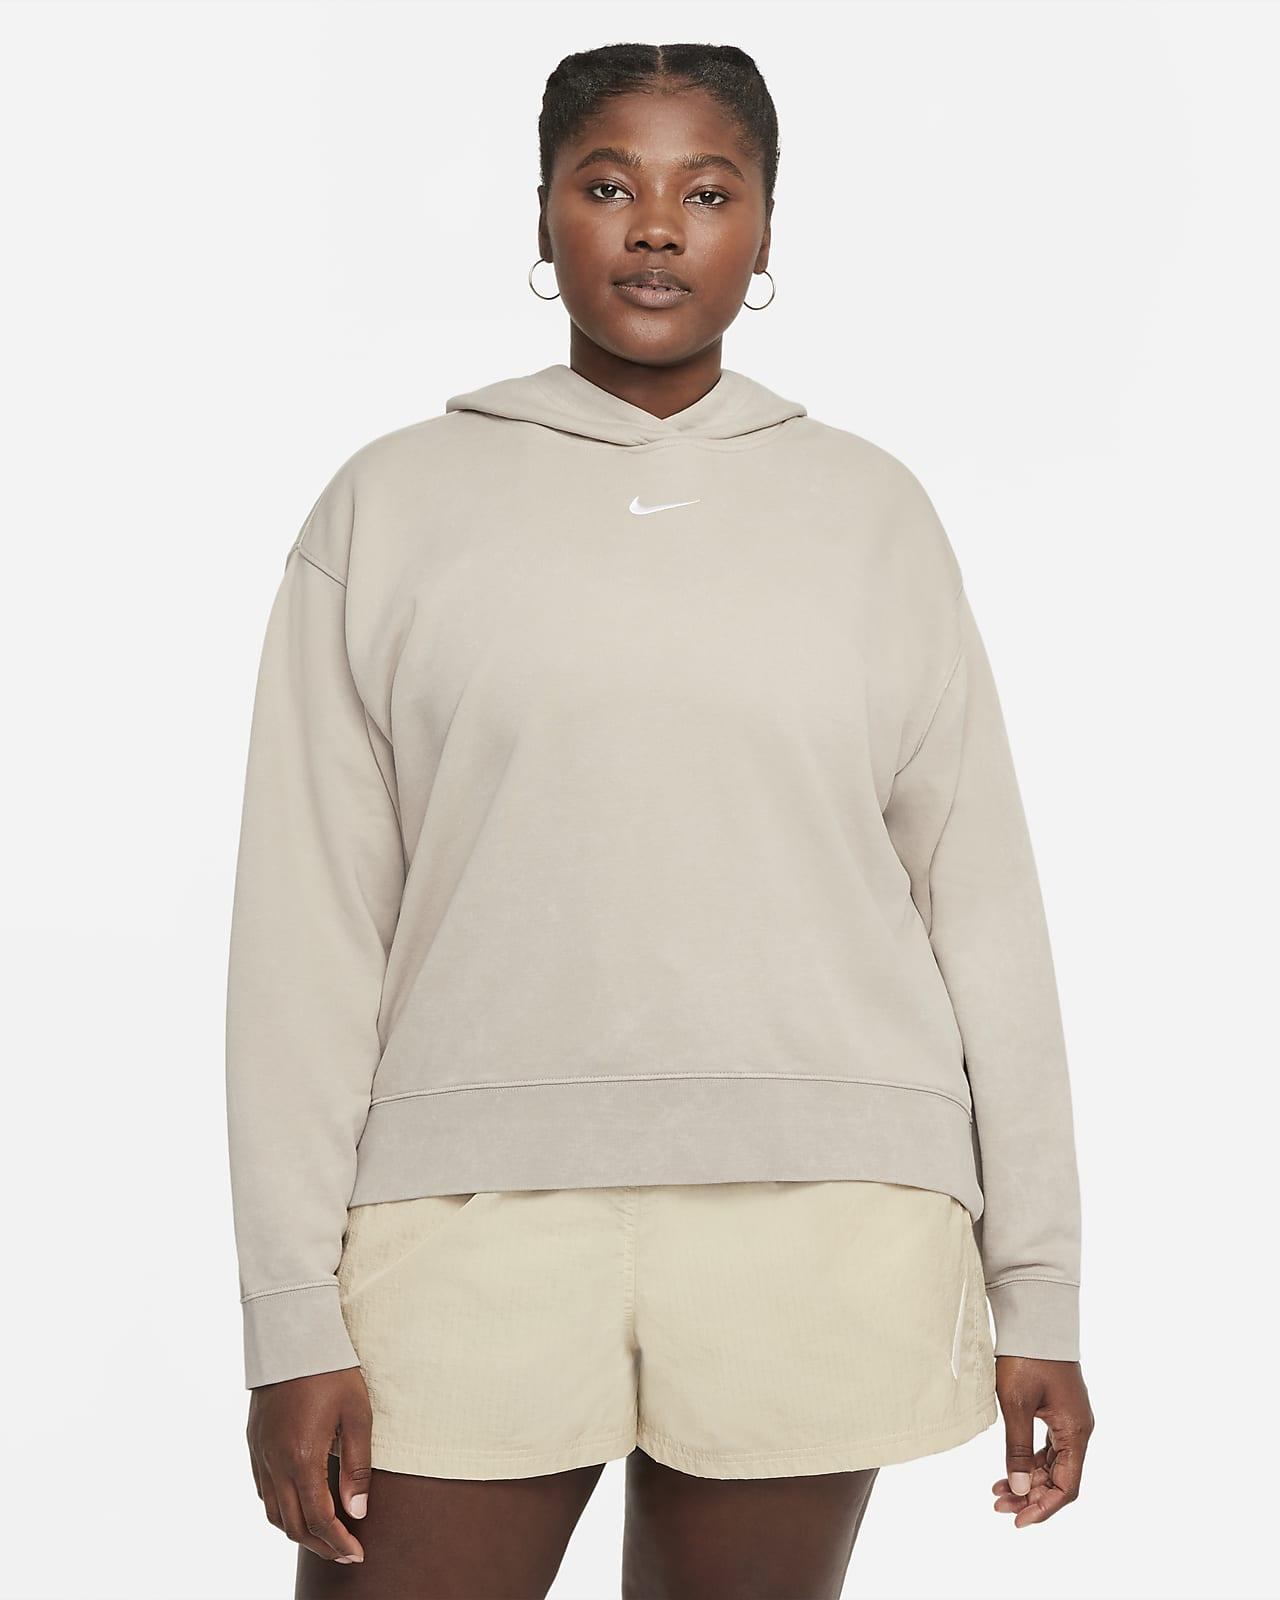 Nike Sportswear Essential Collection Women's Washed Fleece Hoodie (Plus Size)